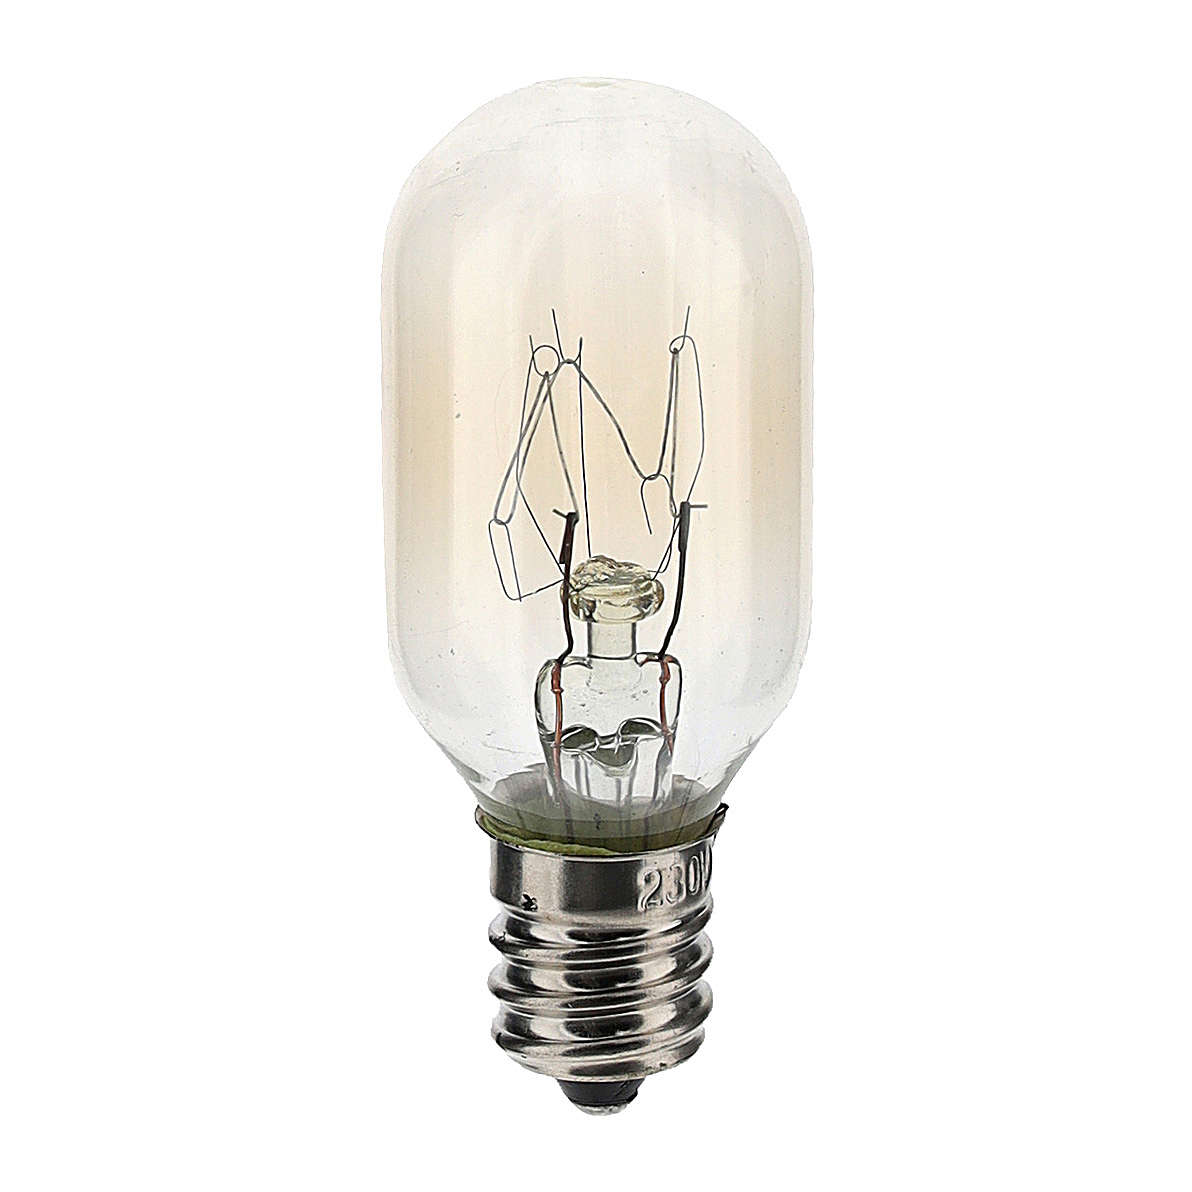 Ampoule 3 lumen 220V E12 1,5W 4